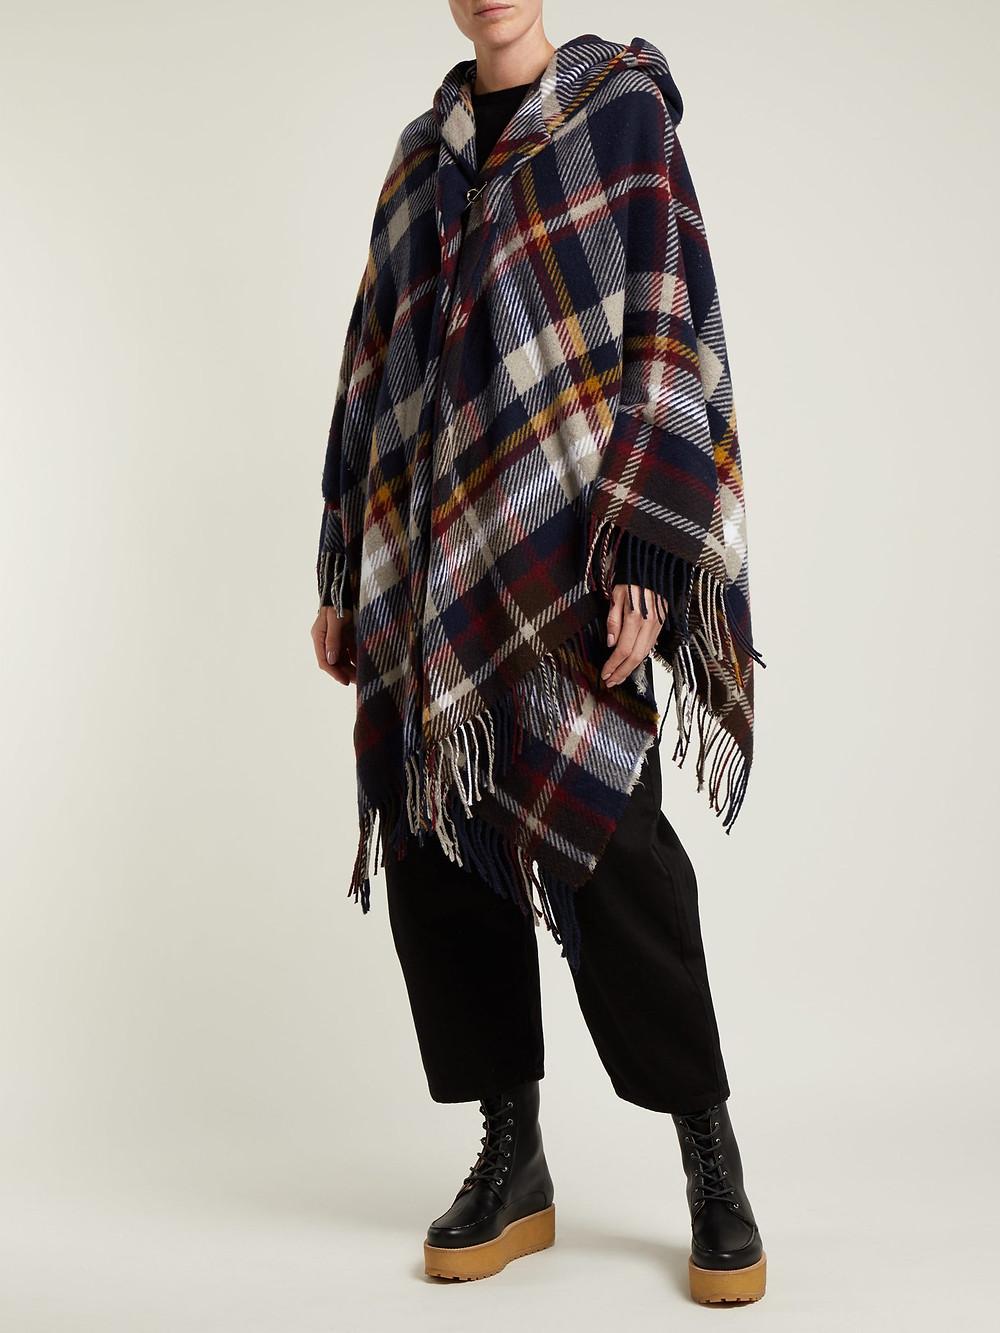 Vivienne Westwood Anglomania Tartan hooded poncho $485